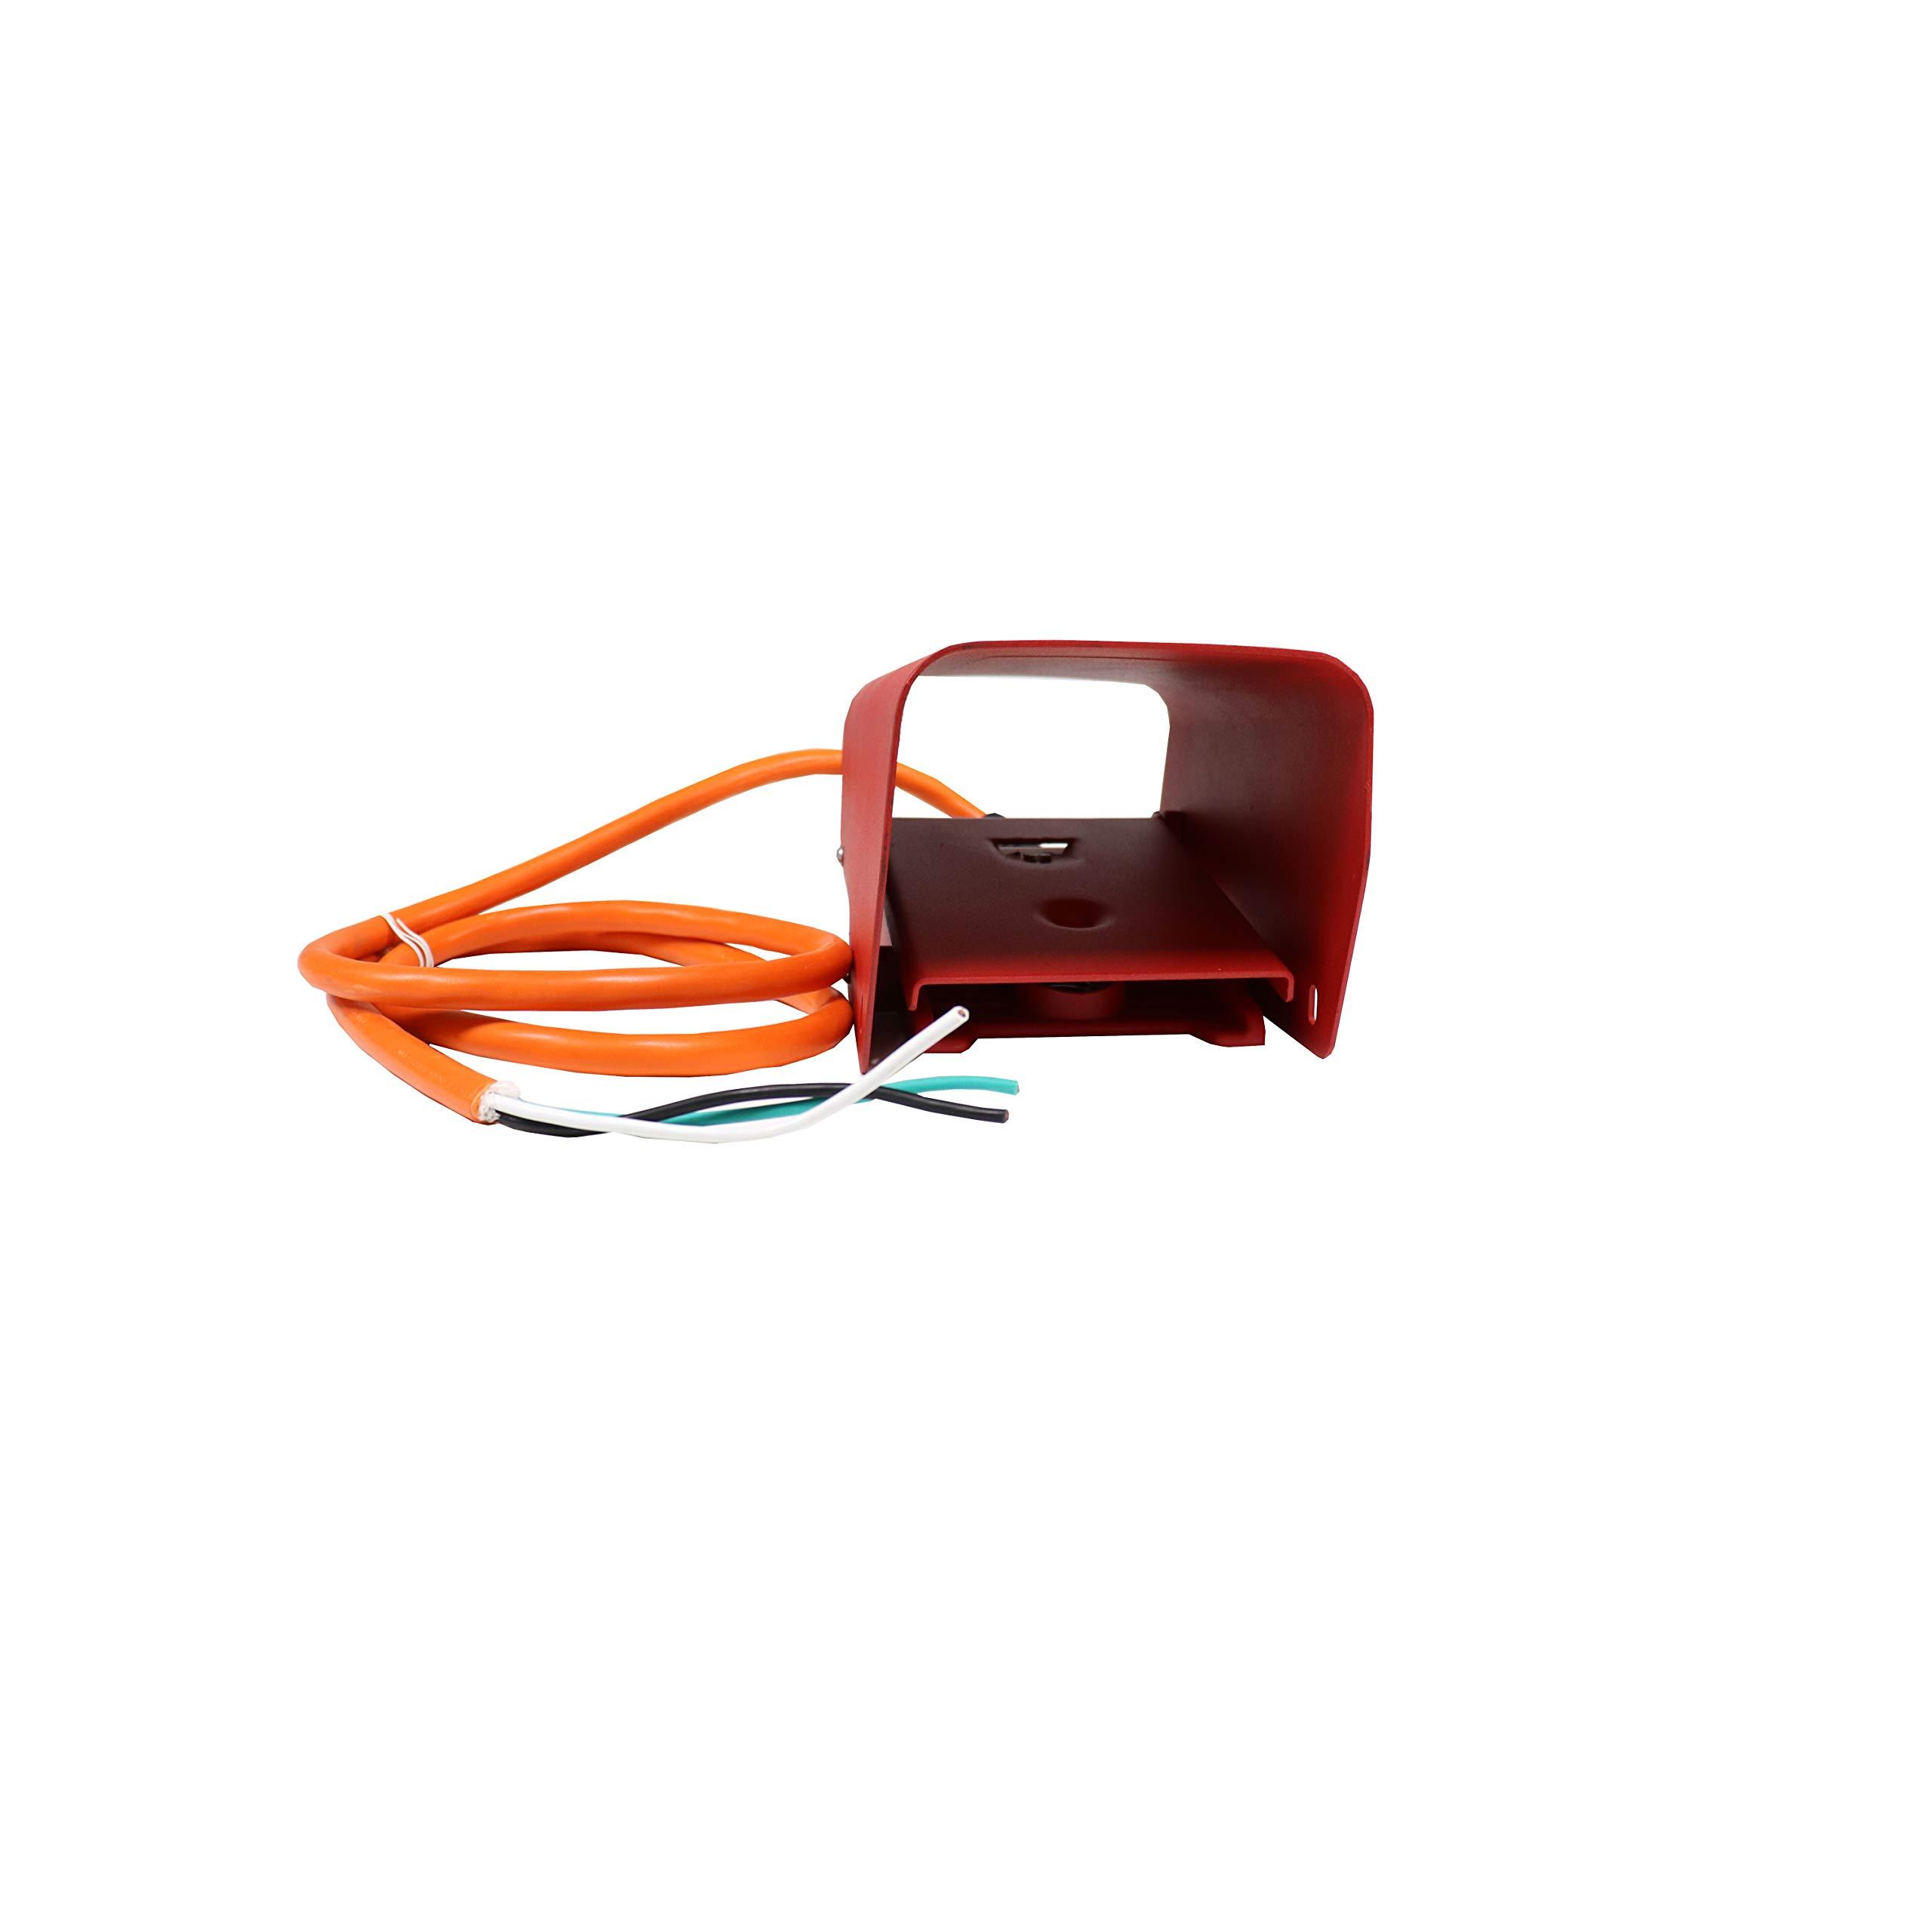 Steel Dragon Tools® 46740 Power Cord fits RIDGID® 300 535 Pipe Threading Machine